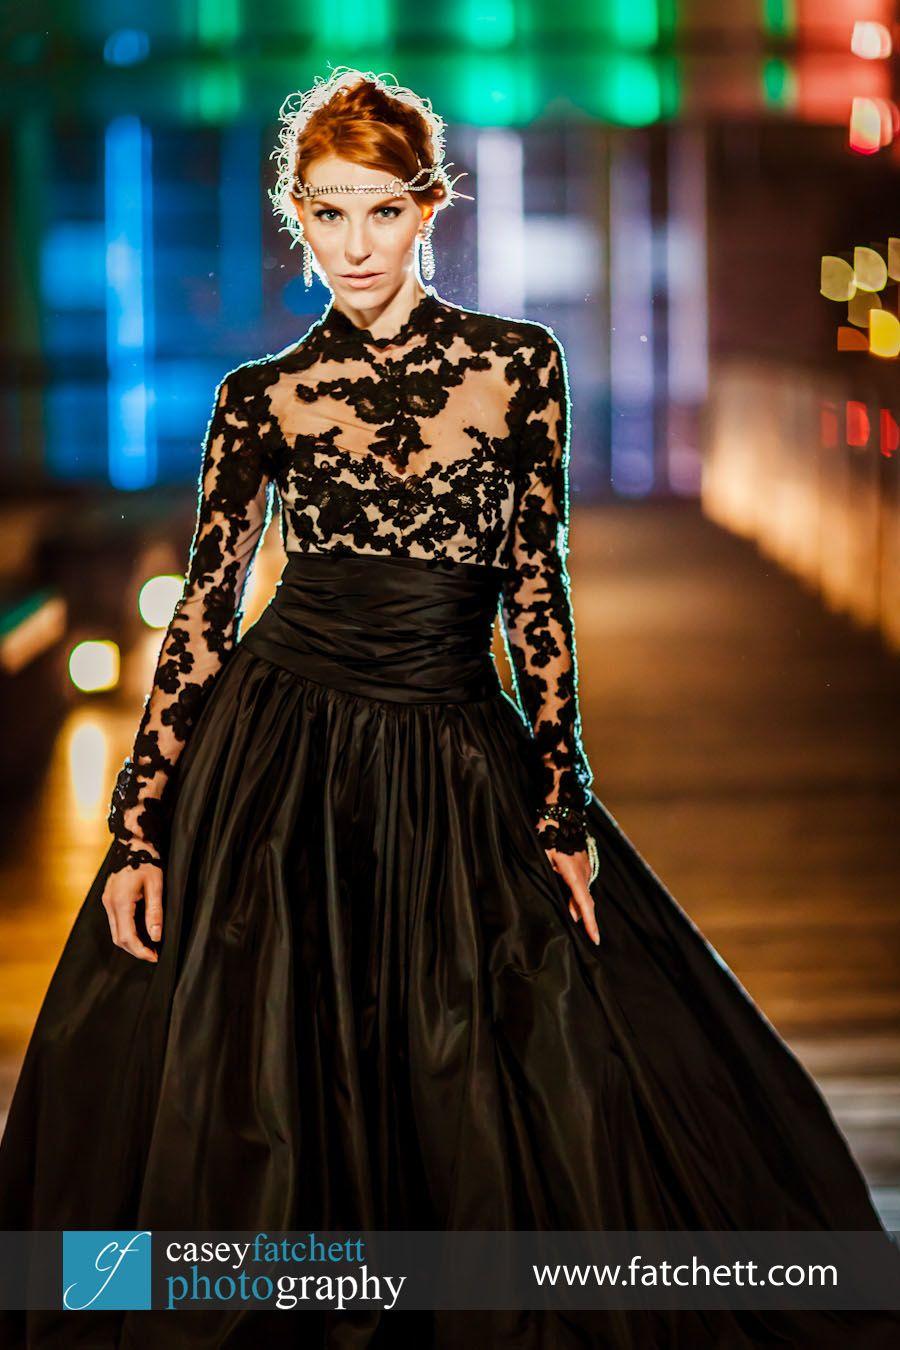 Dress marchesa photo by casey fatchett copyright